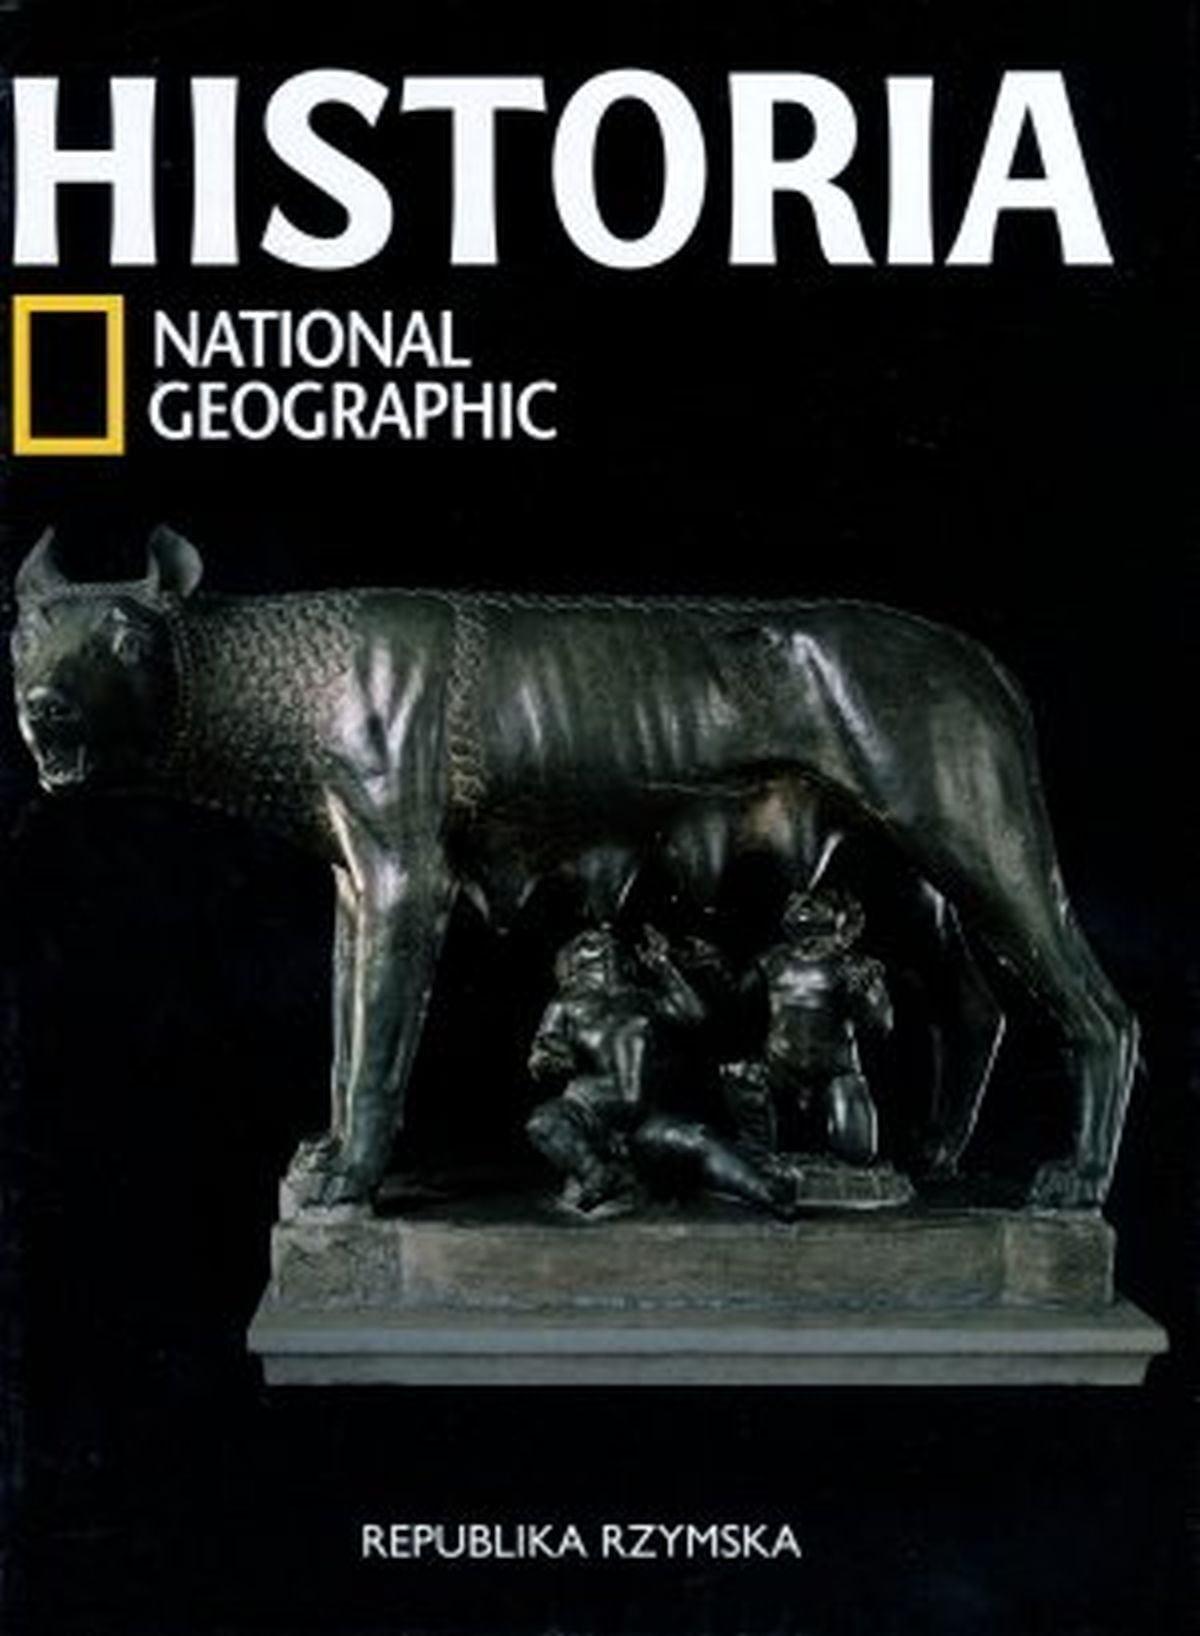 Historia National Geographic. Tom 10. Republika Rzymska